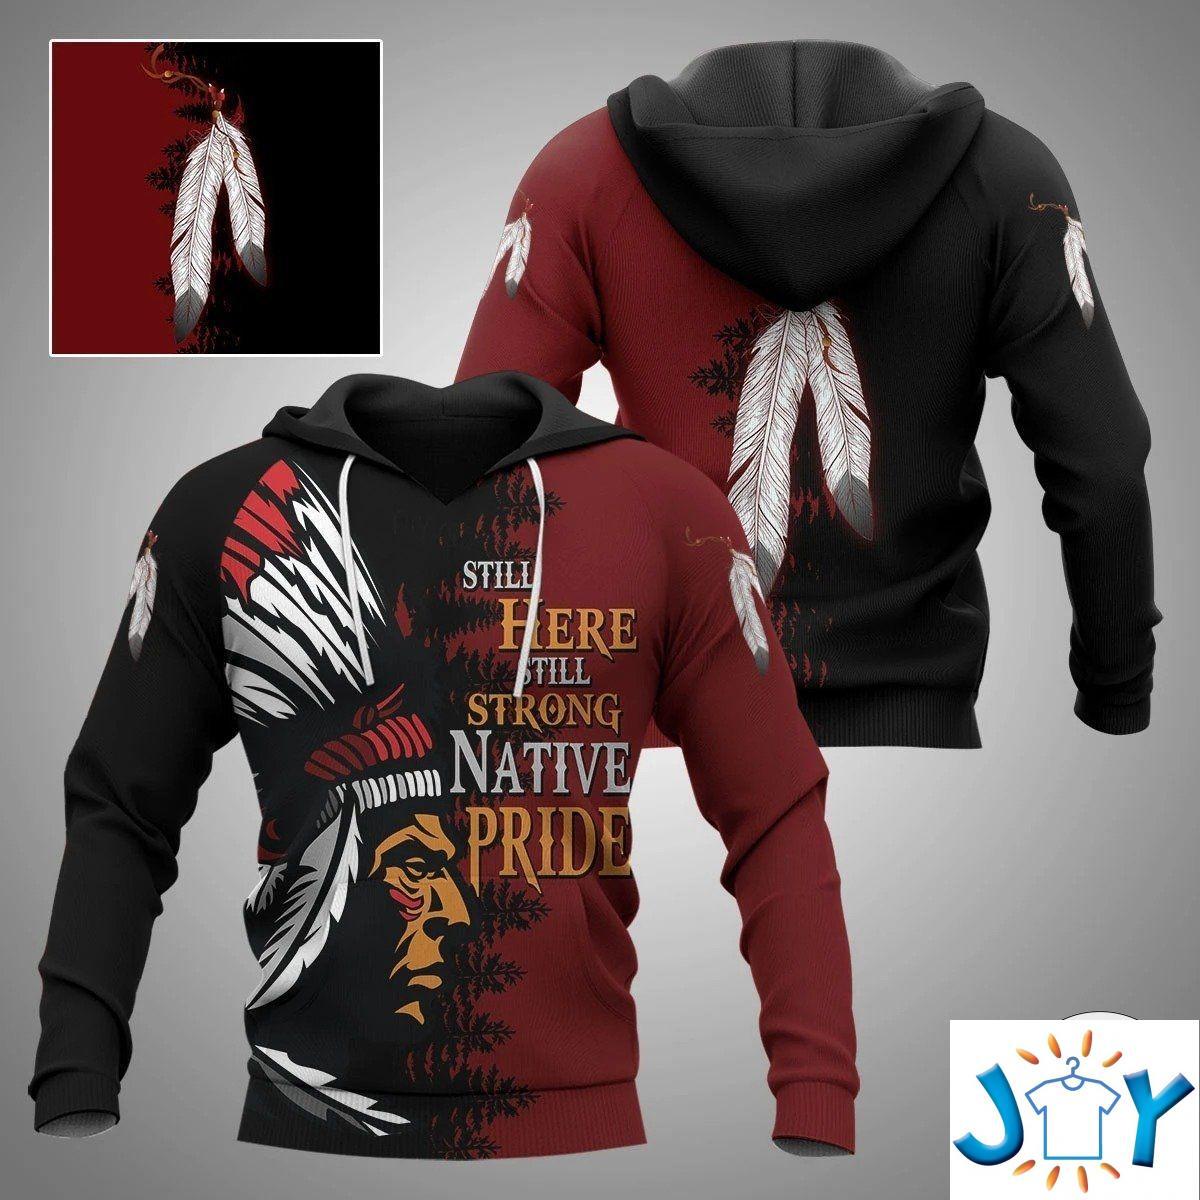 Still Here Still Strong Native Pride 3D Hoodies